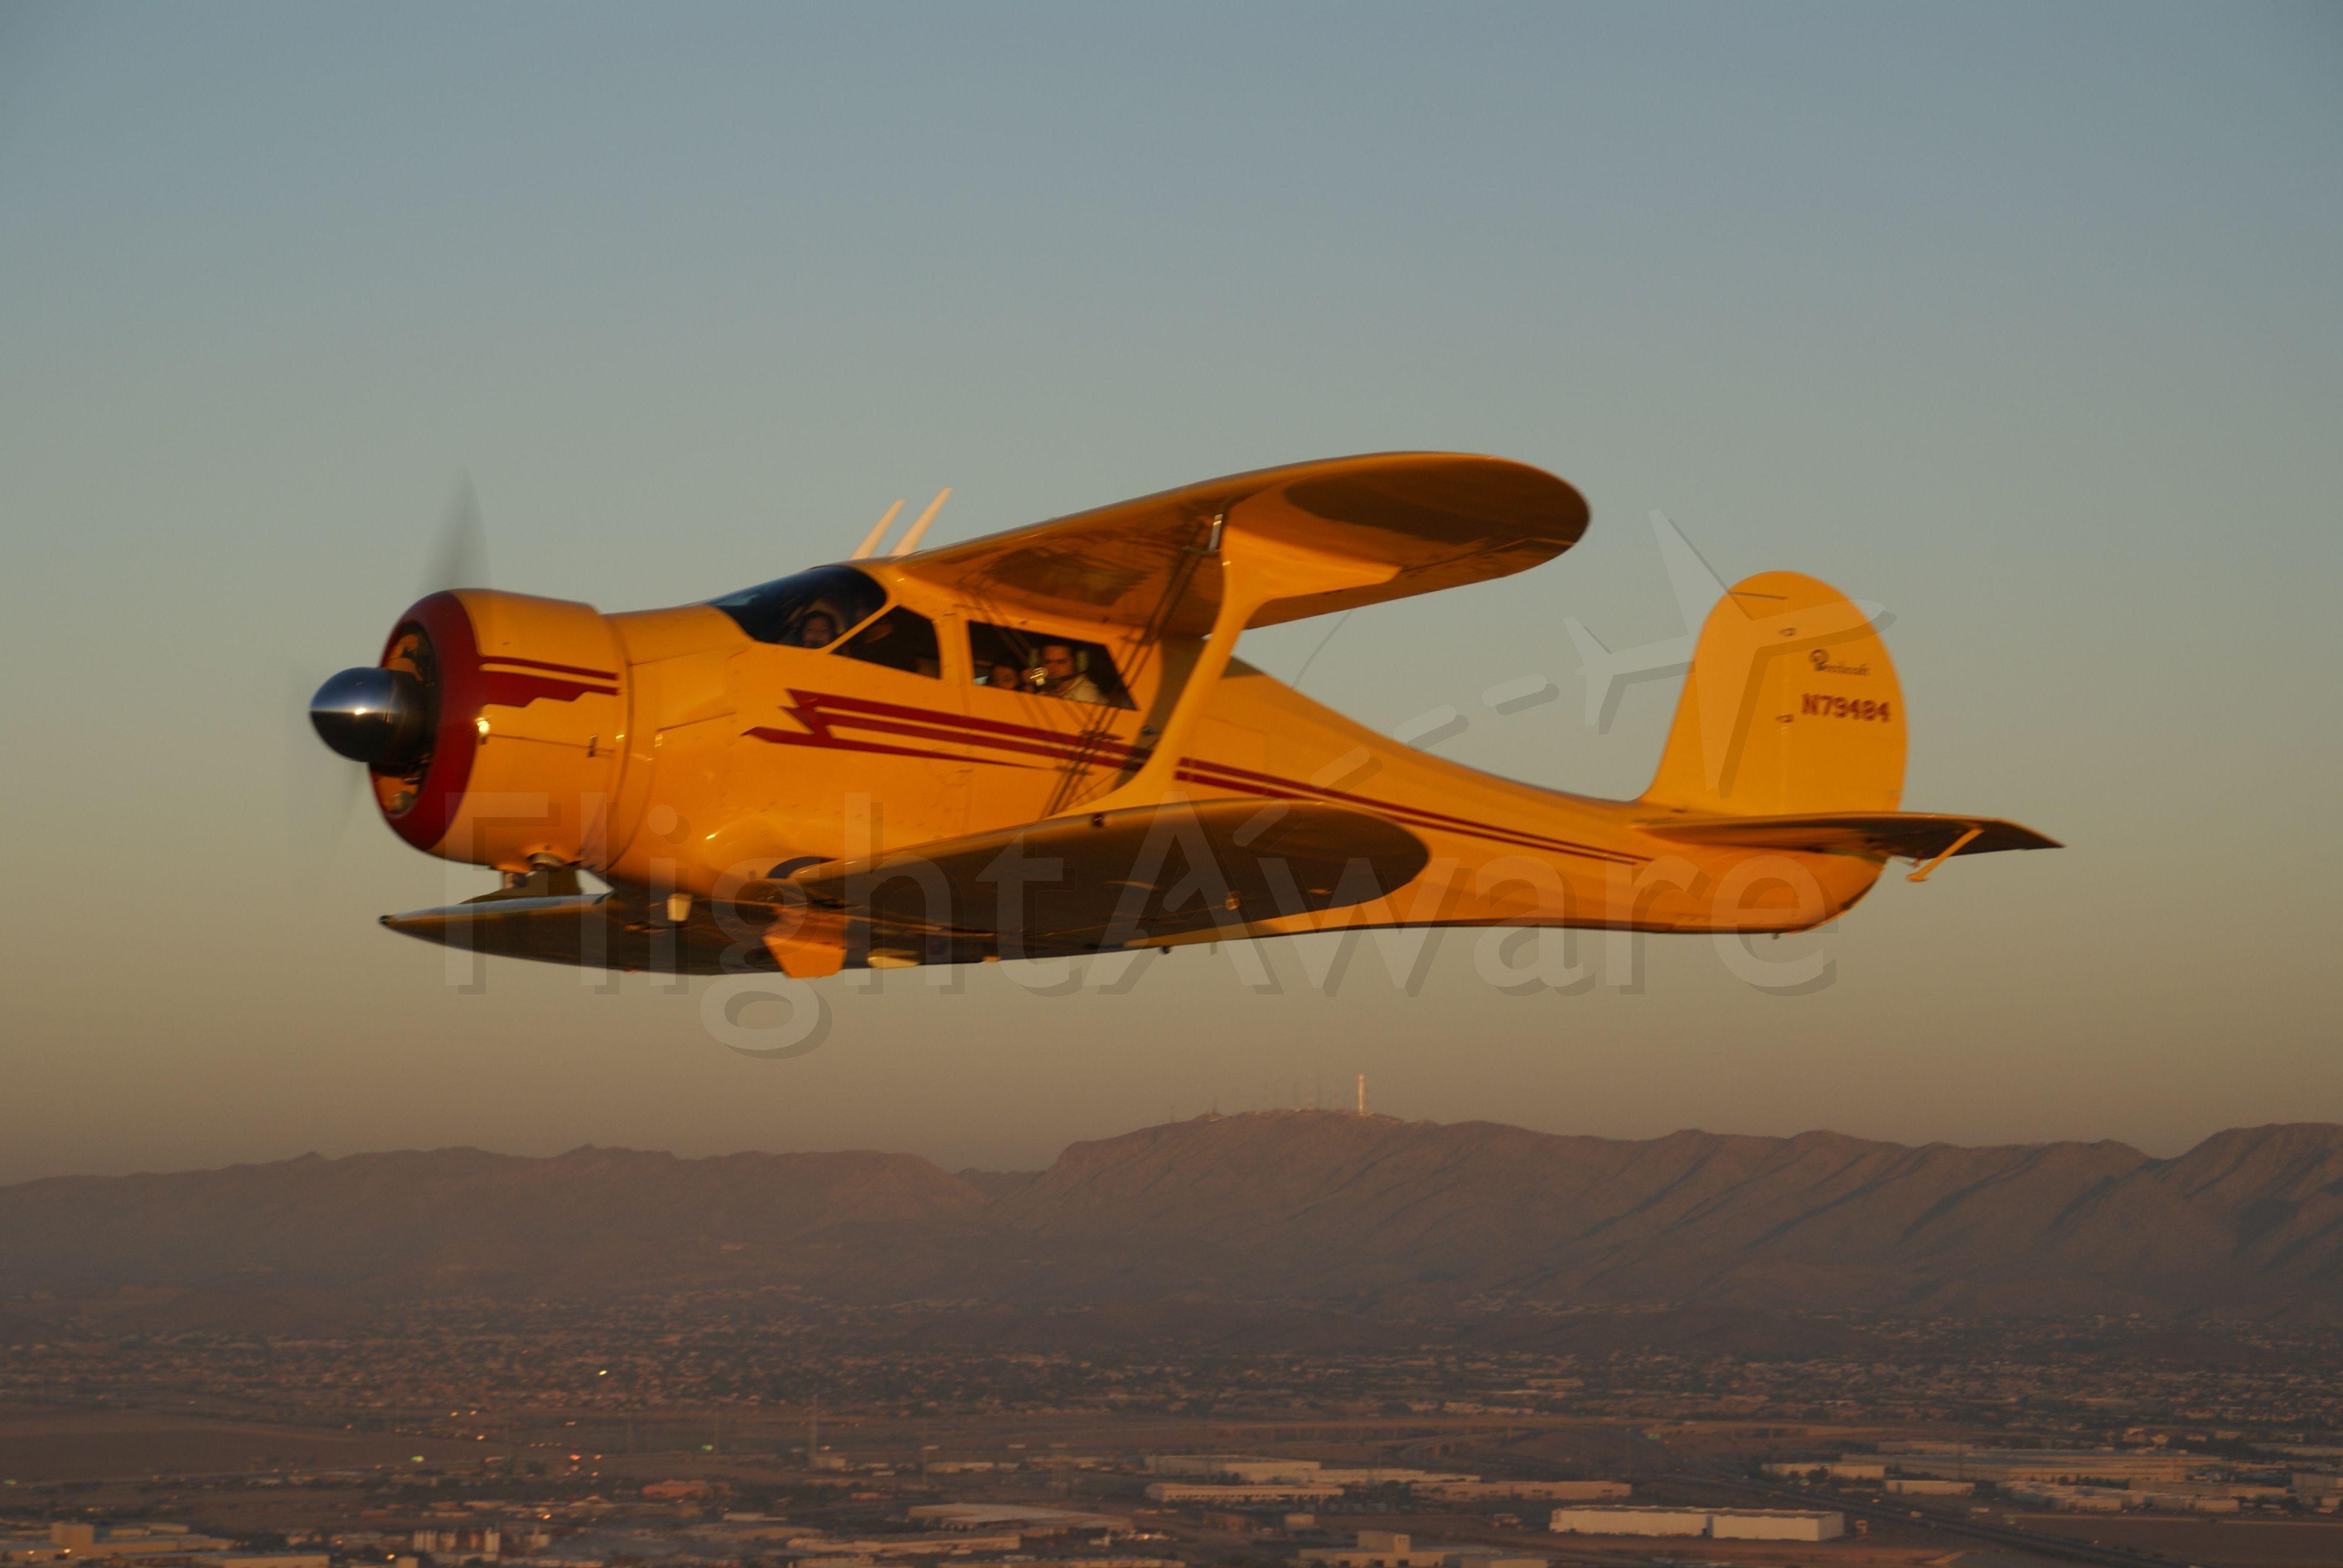 N79484 — - Beechcraft Stagger Wing over Maricopa, AZ